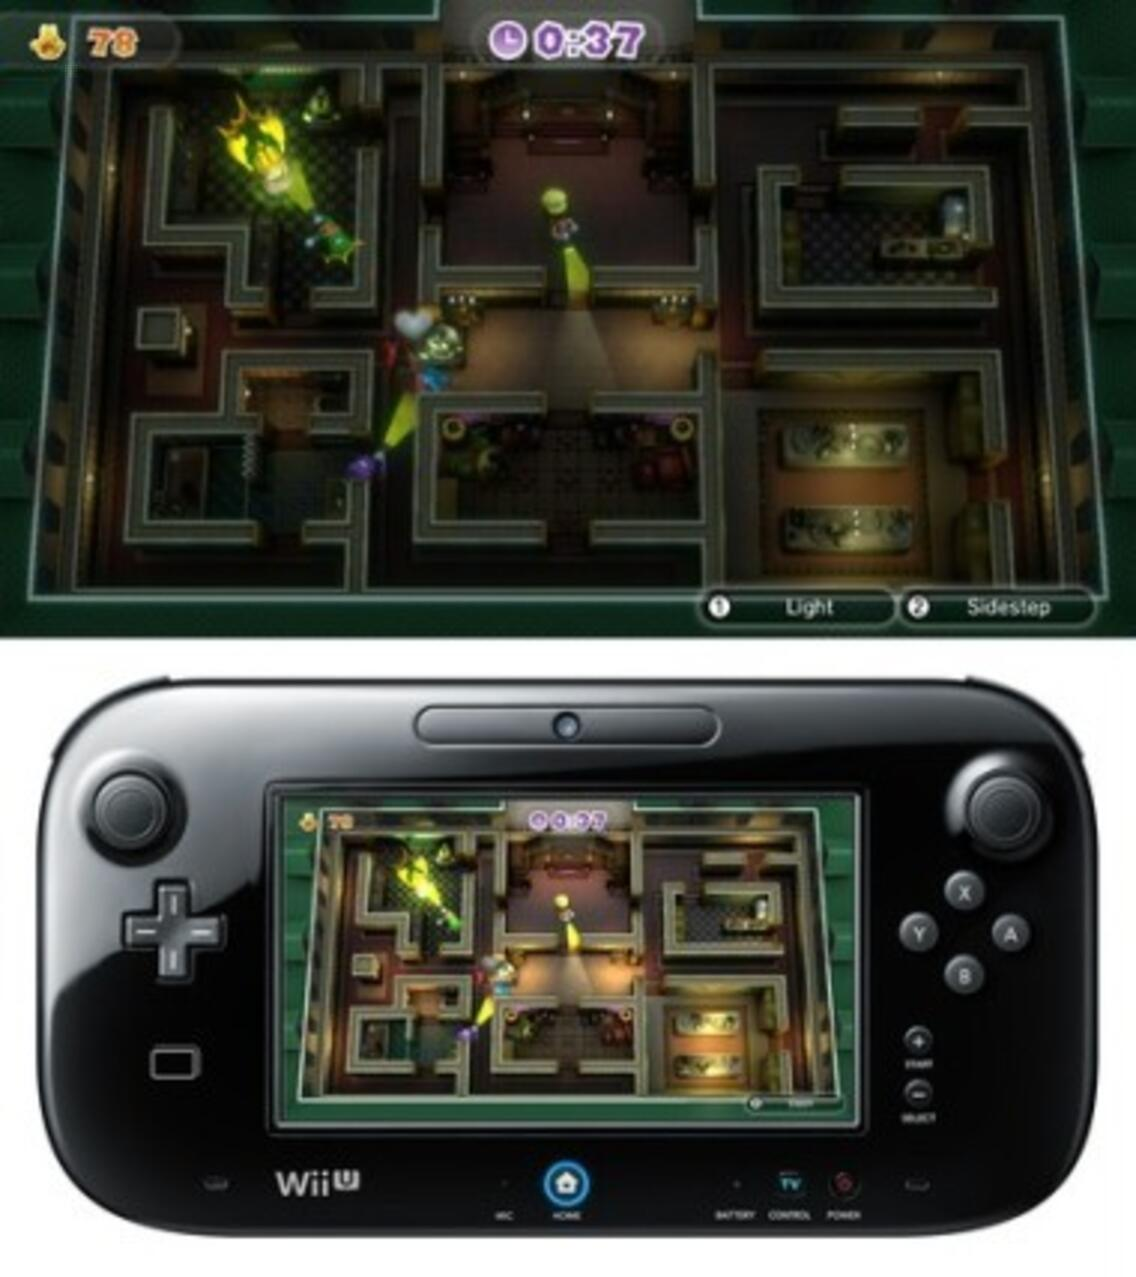 Nintendo Wii U Screenshot